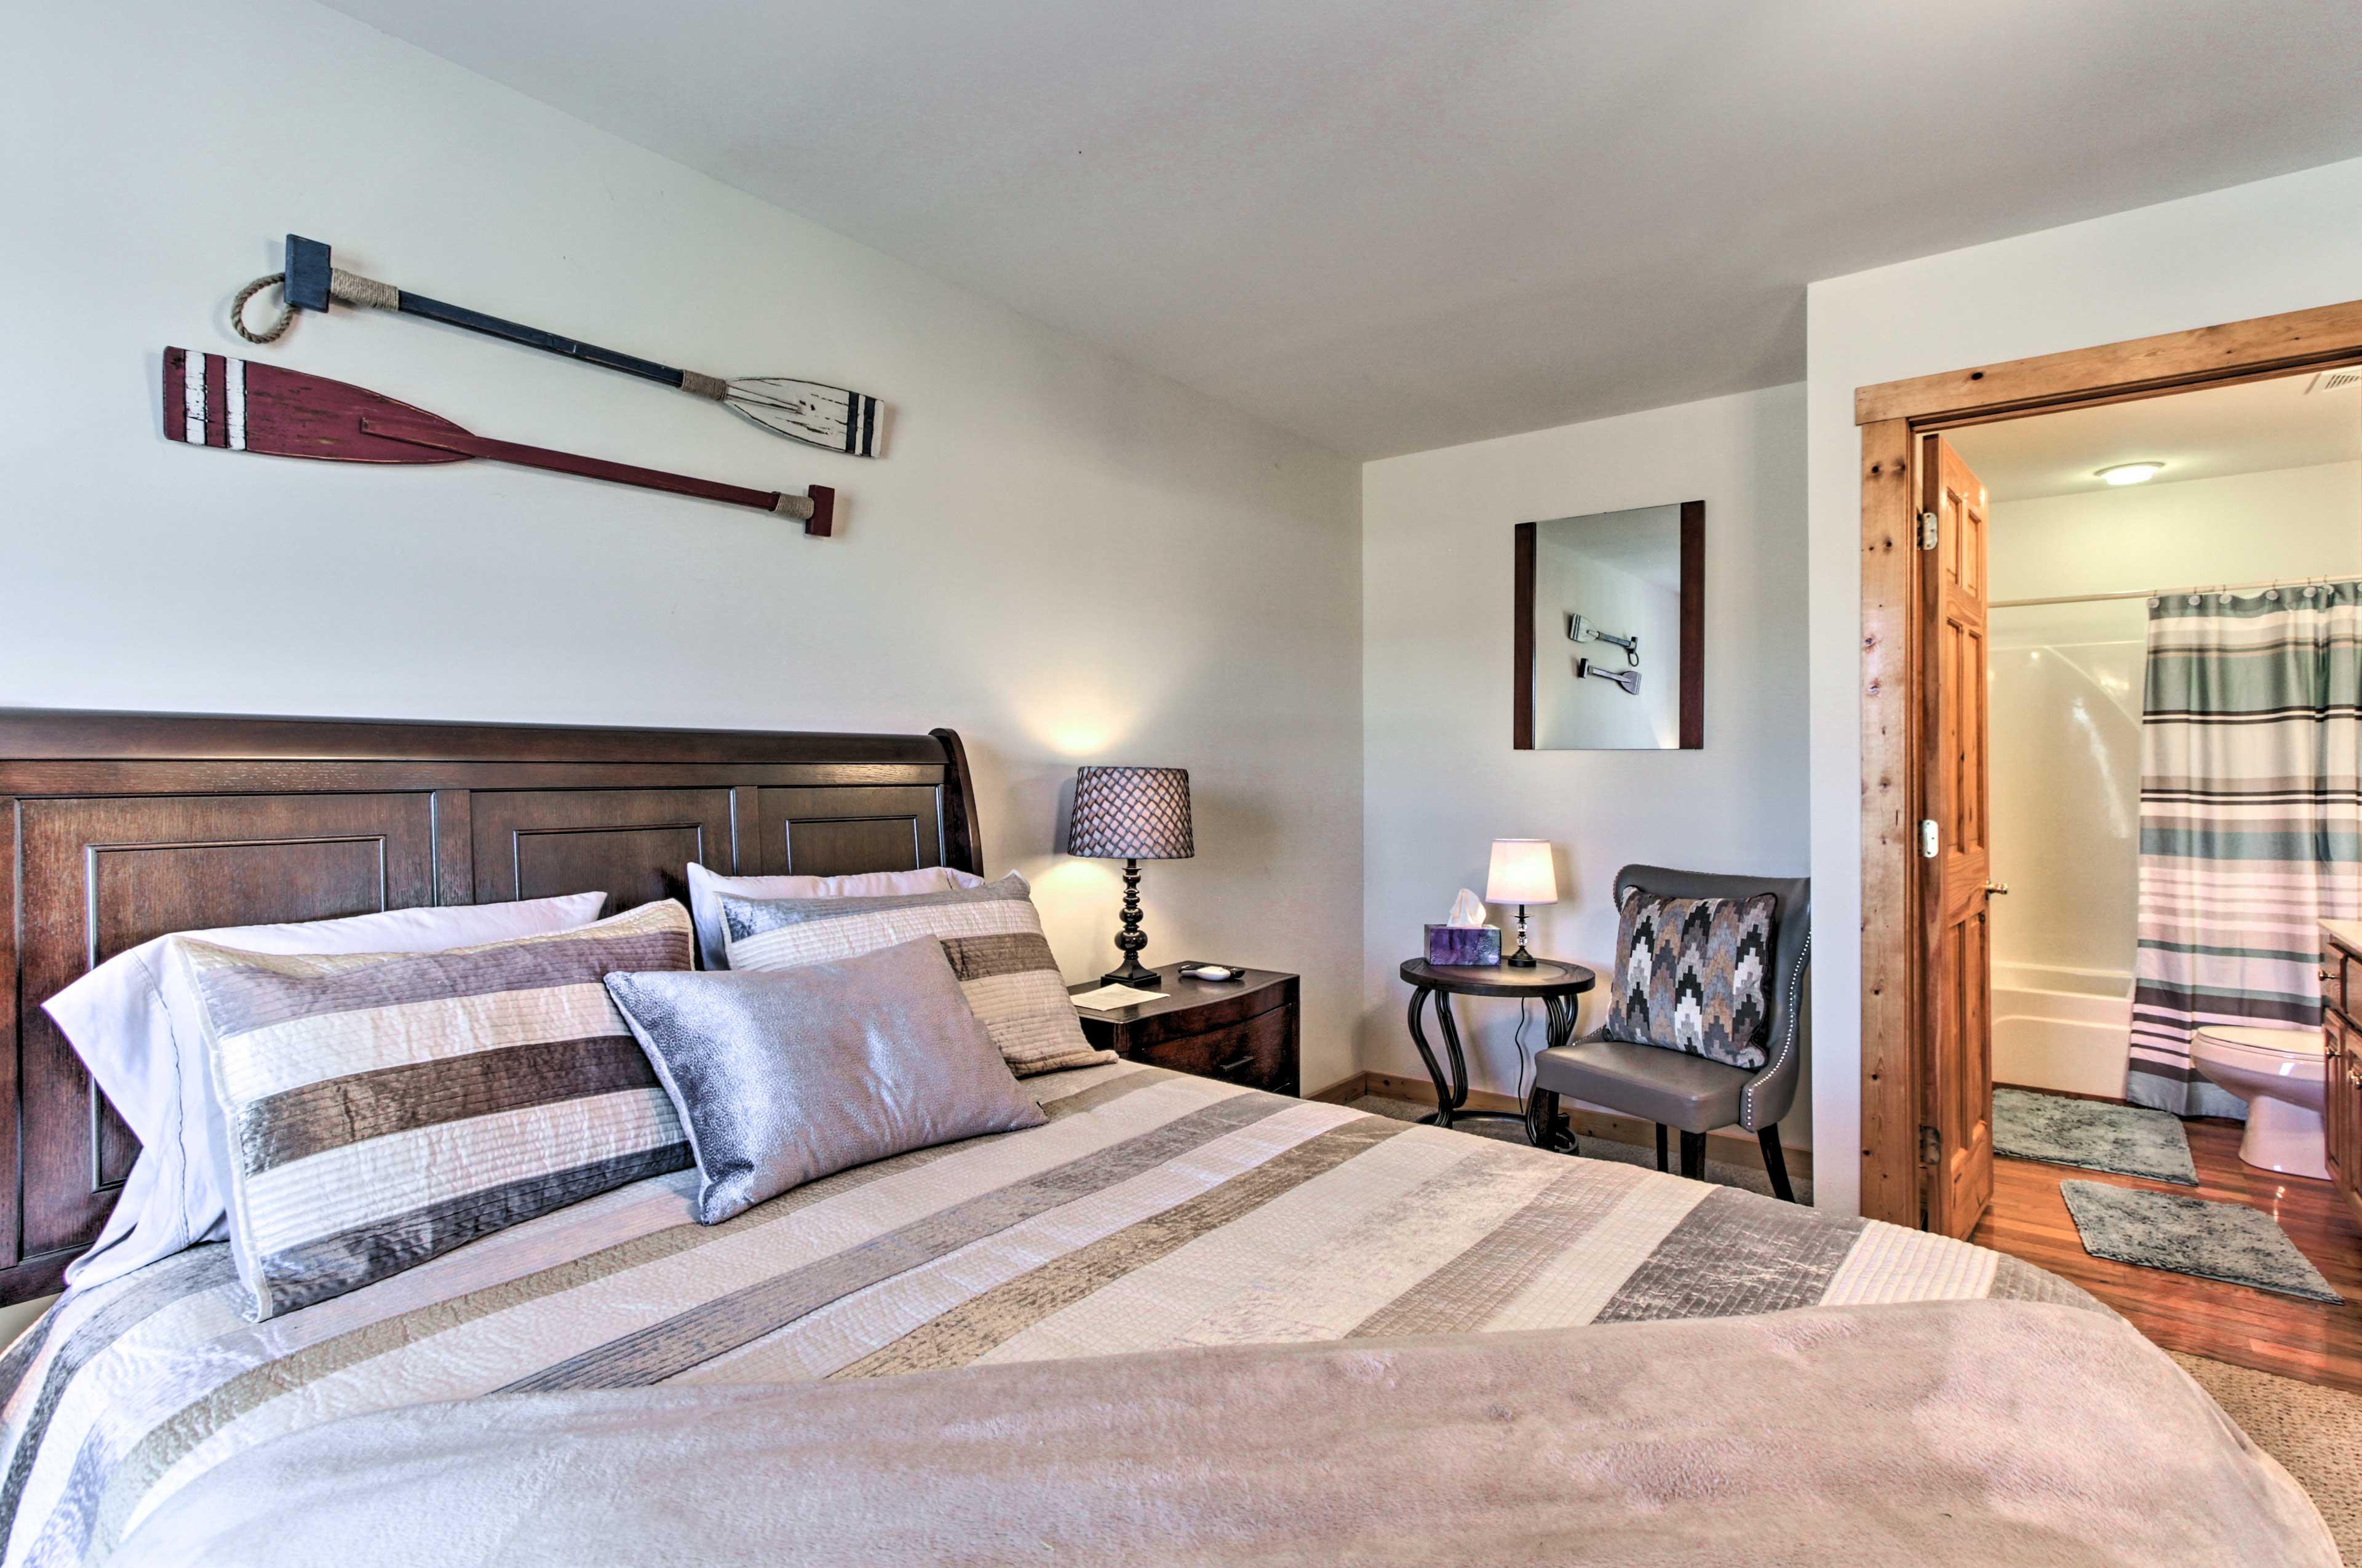 This spacious bedroom features a private en-suite bathroom.